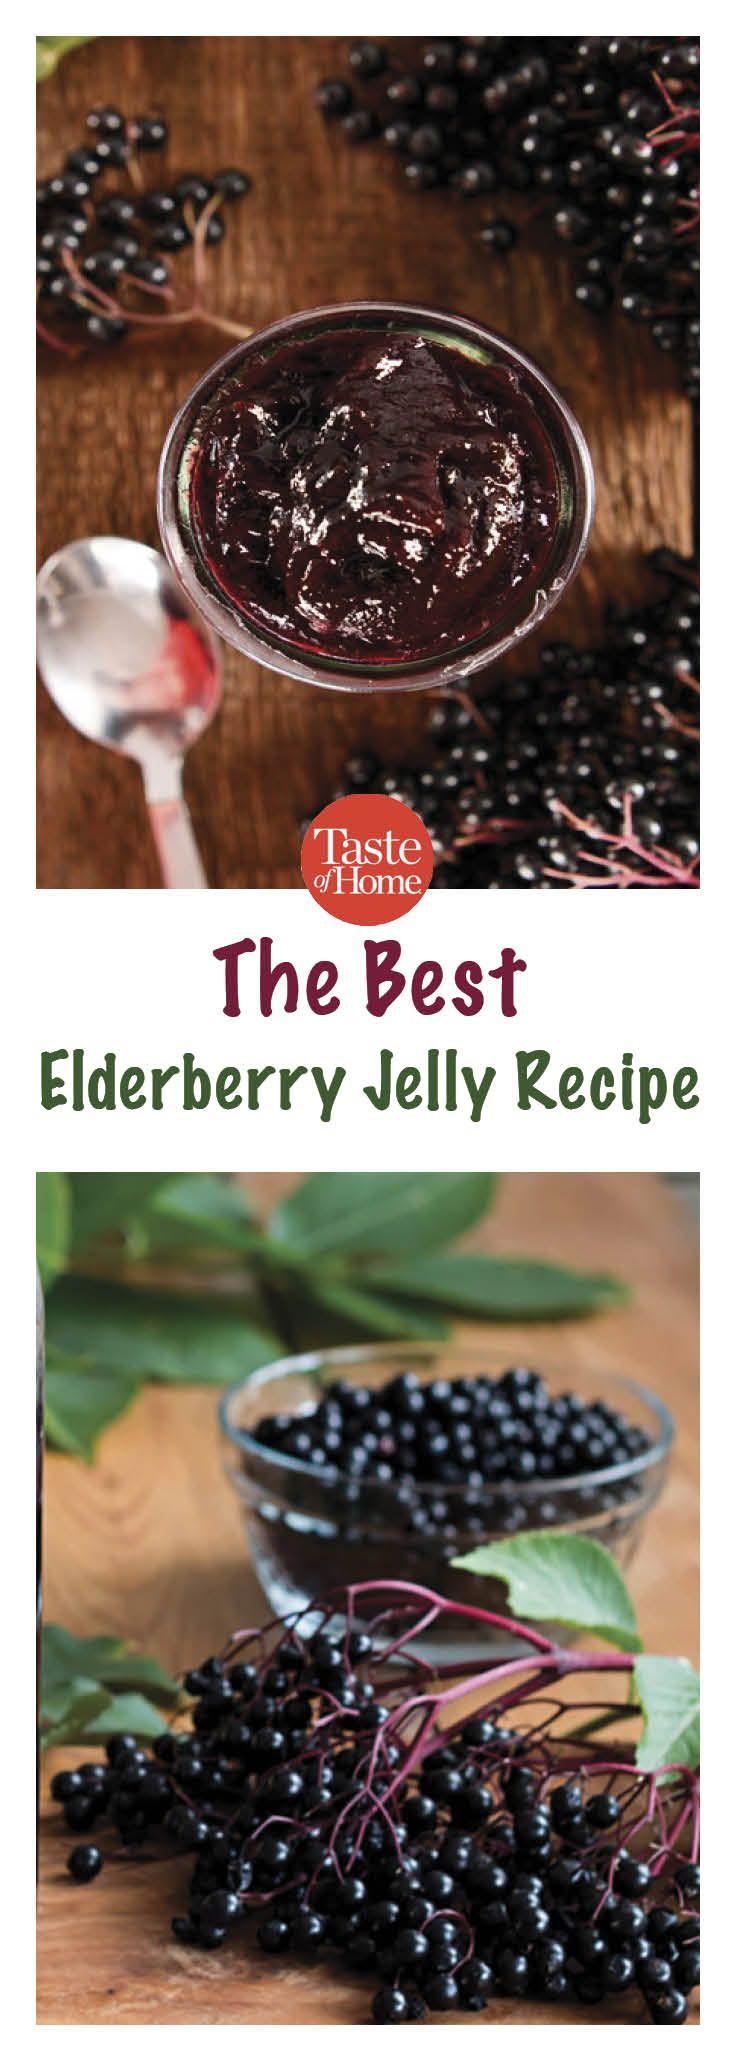 The Best Elderberry Jelly Recipe